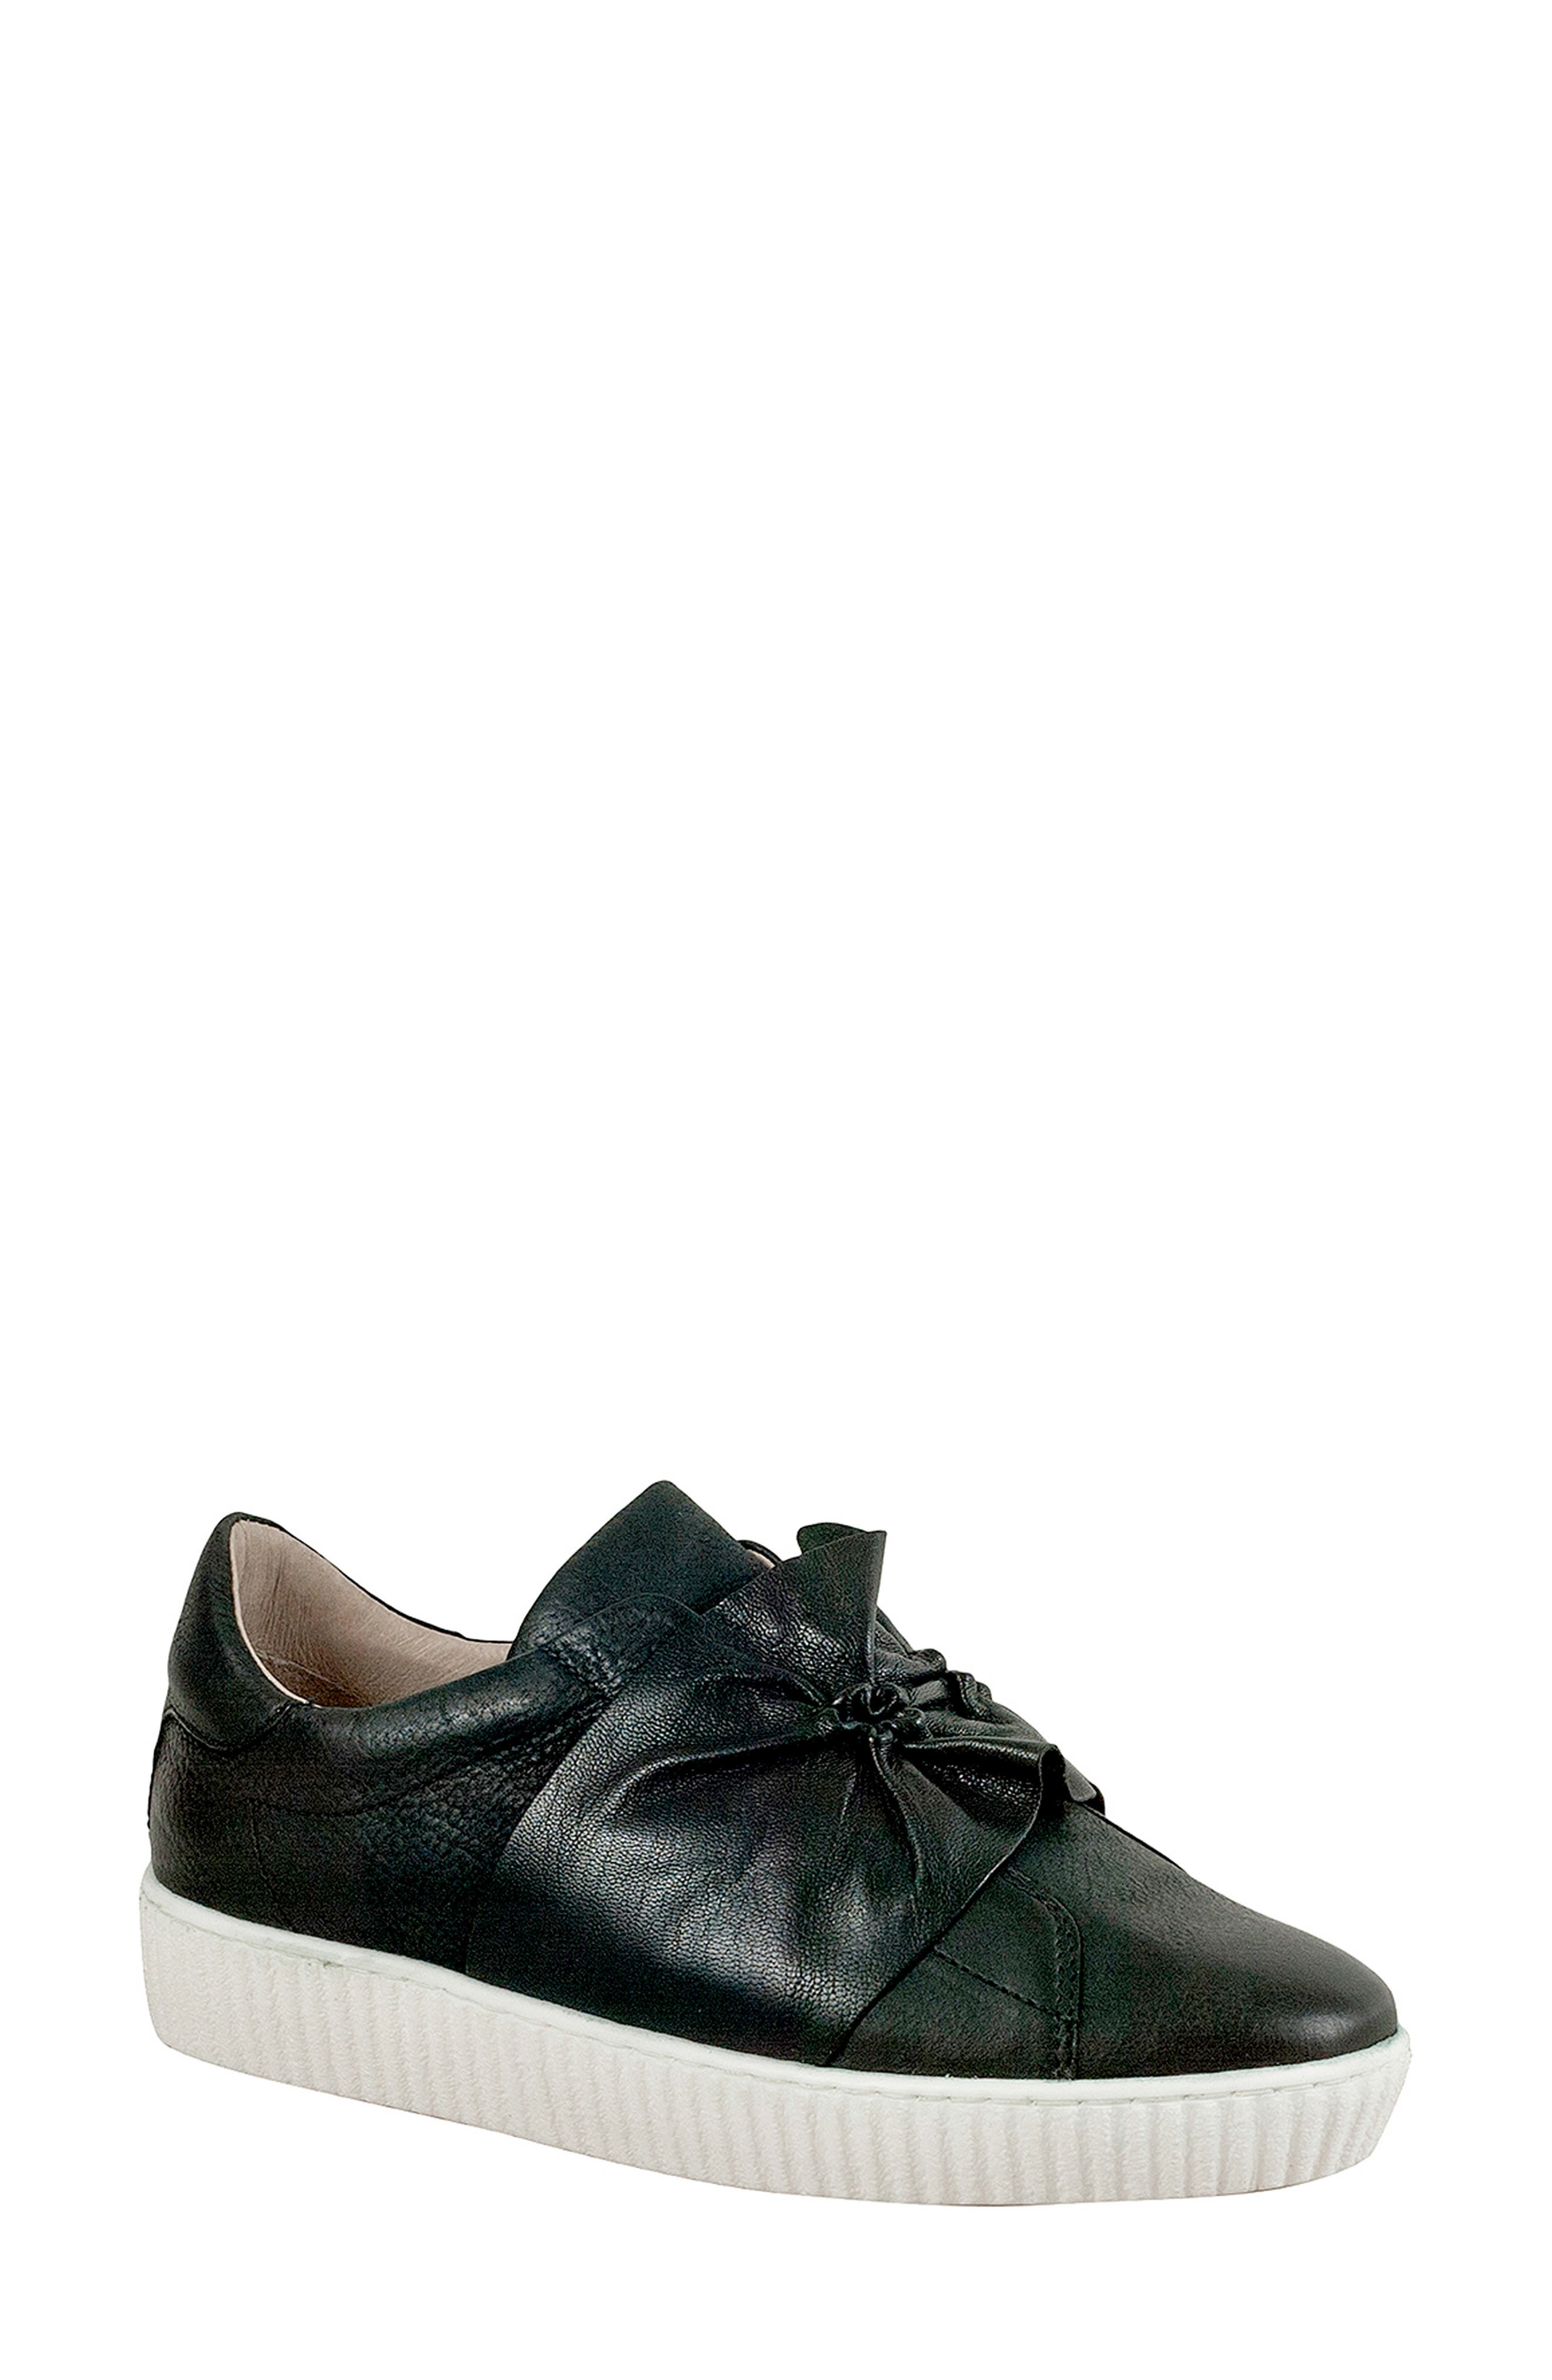 Miz Mooz Orbit Slip-On Sneaker, Black